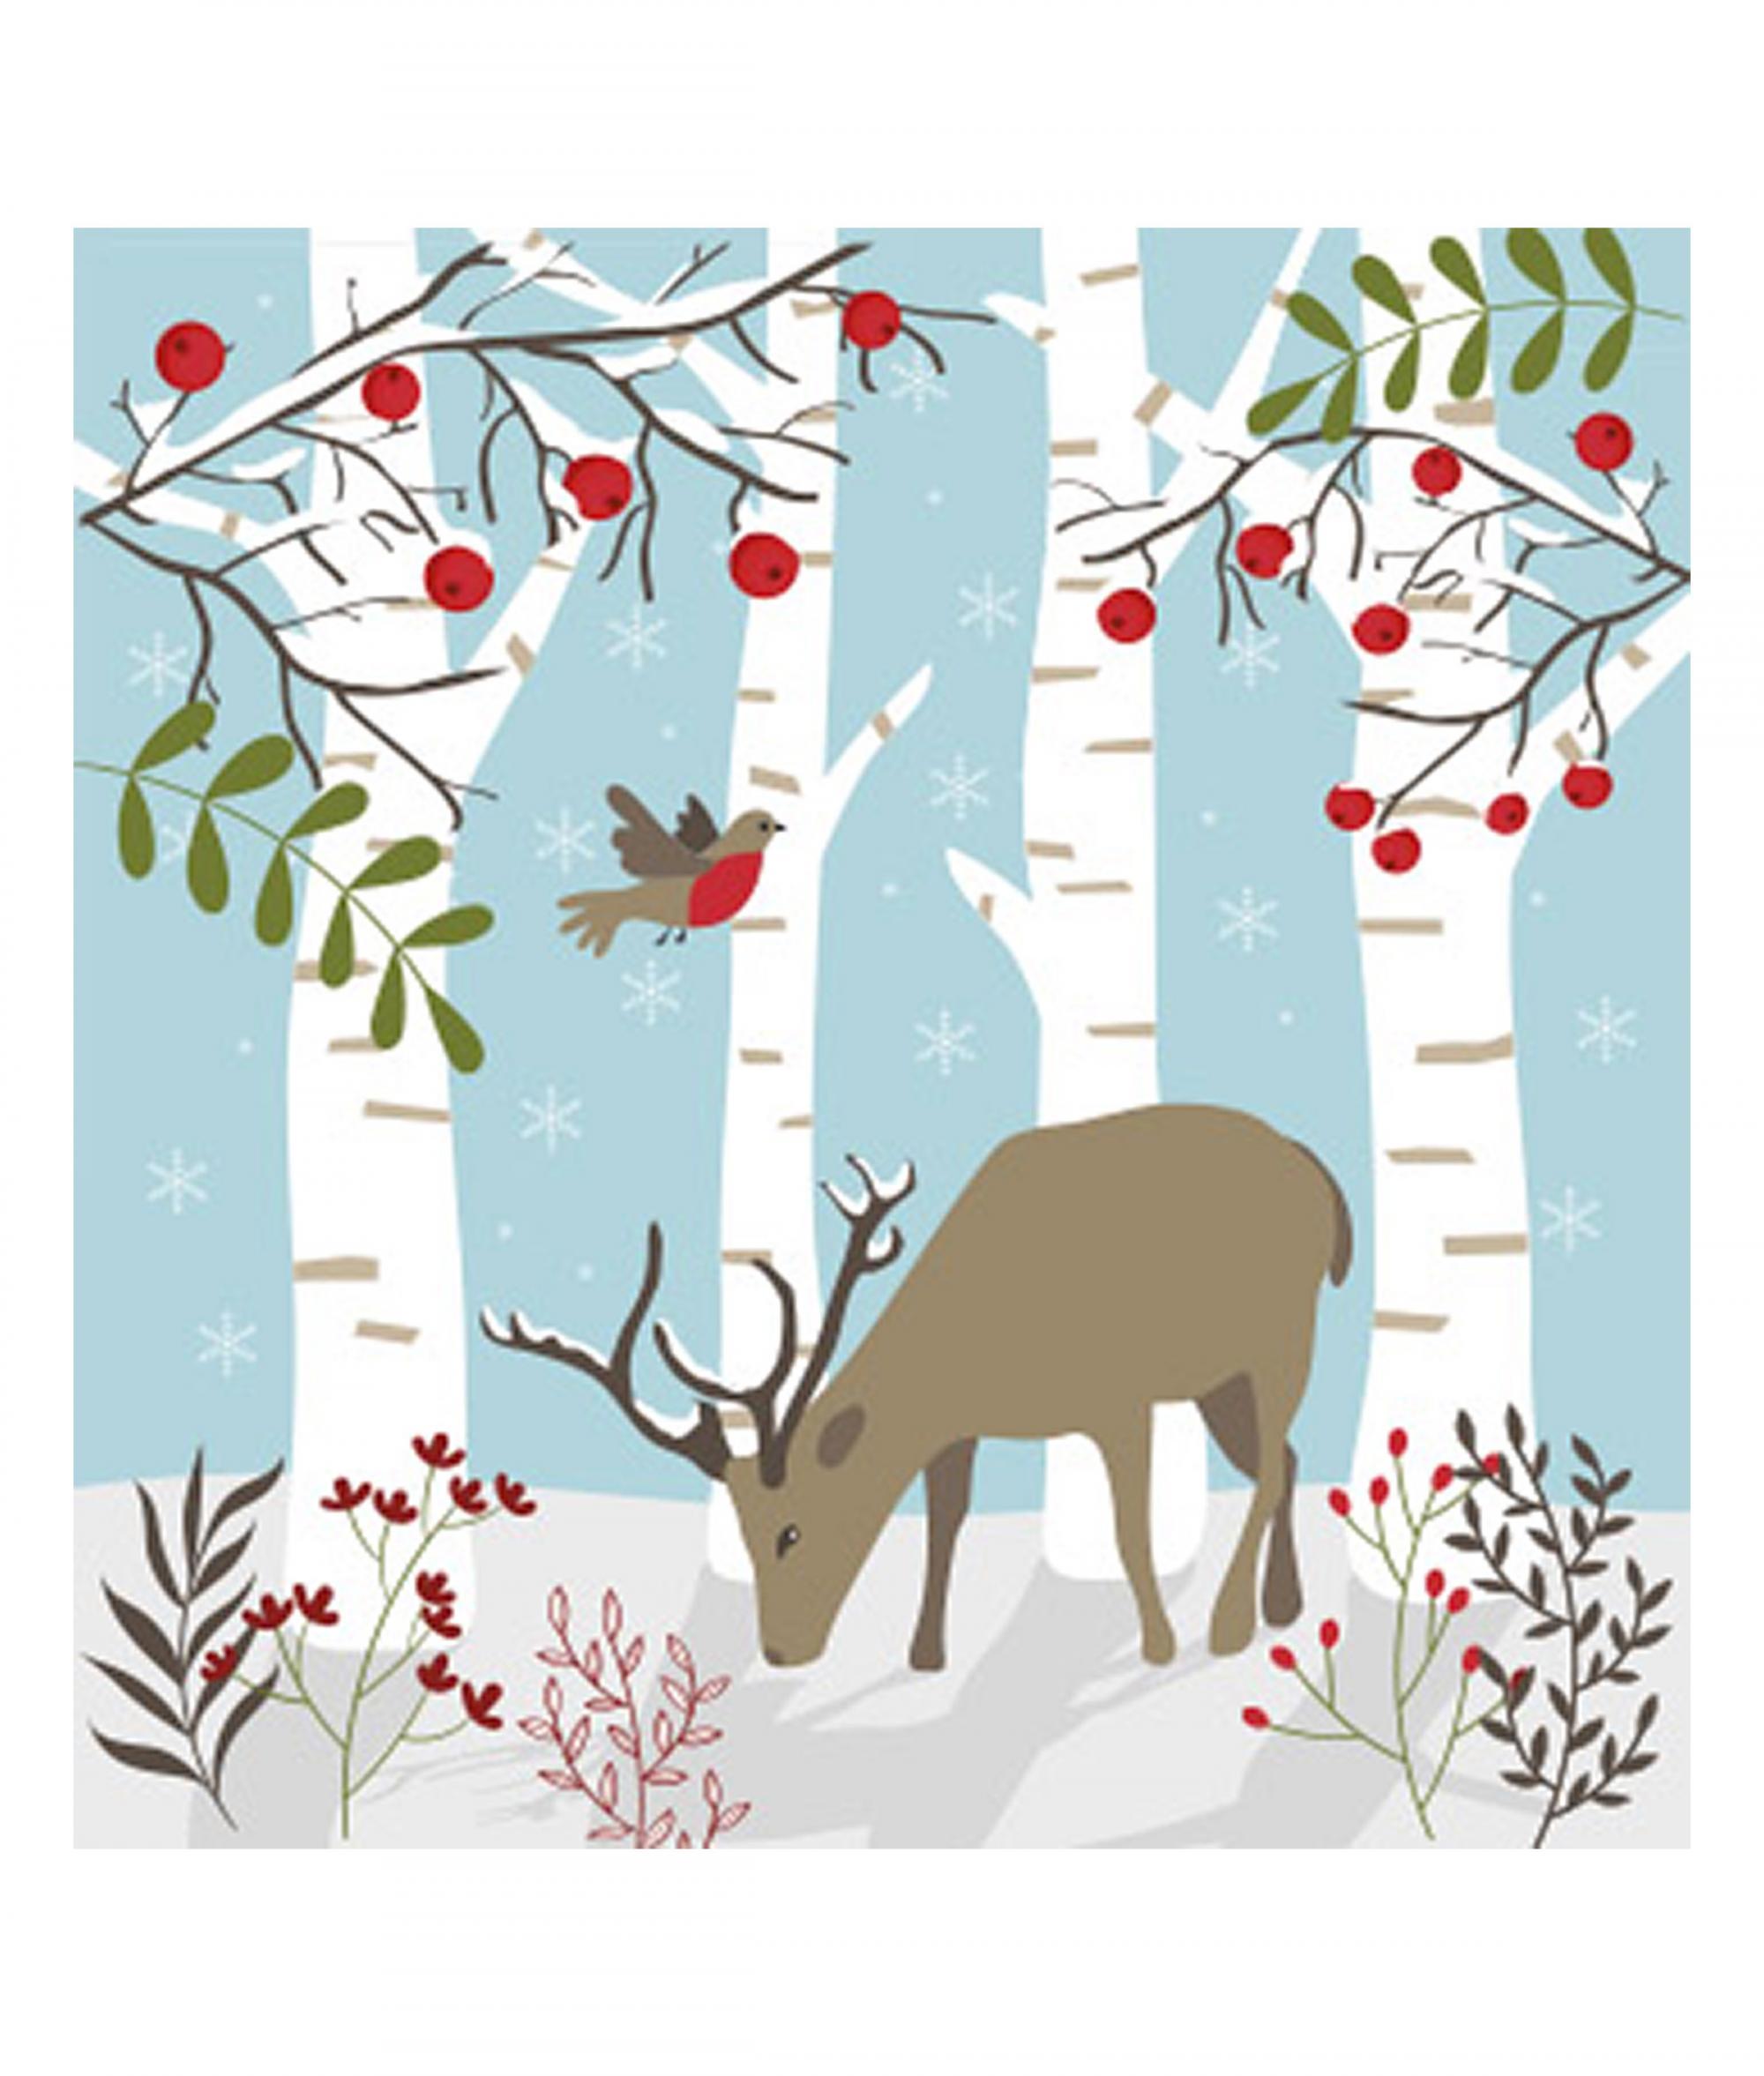 Reindeer Christmas Cards.Woodland Reindeer Christmas Card Pack Of 10 Cancer